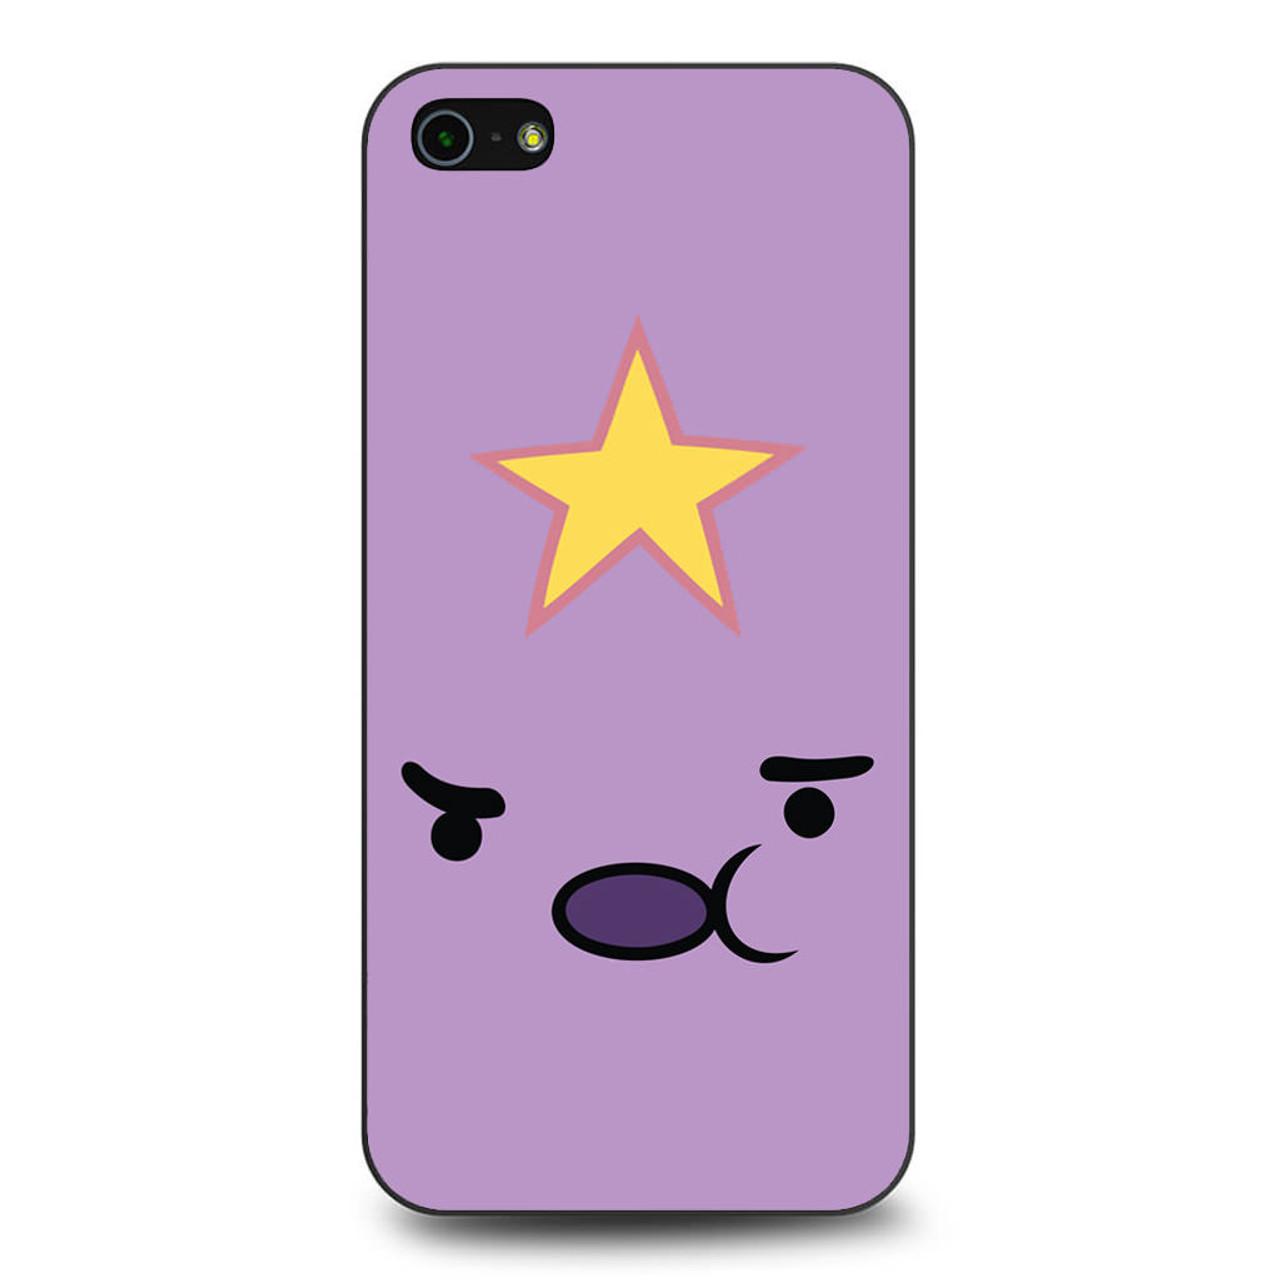 timeless design 4c88e ef35a Advanture Time Lumpy Space Princess iPhone 5/5S/SE Case